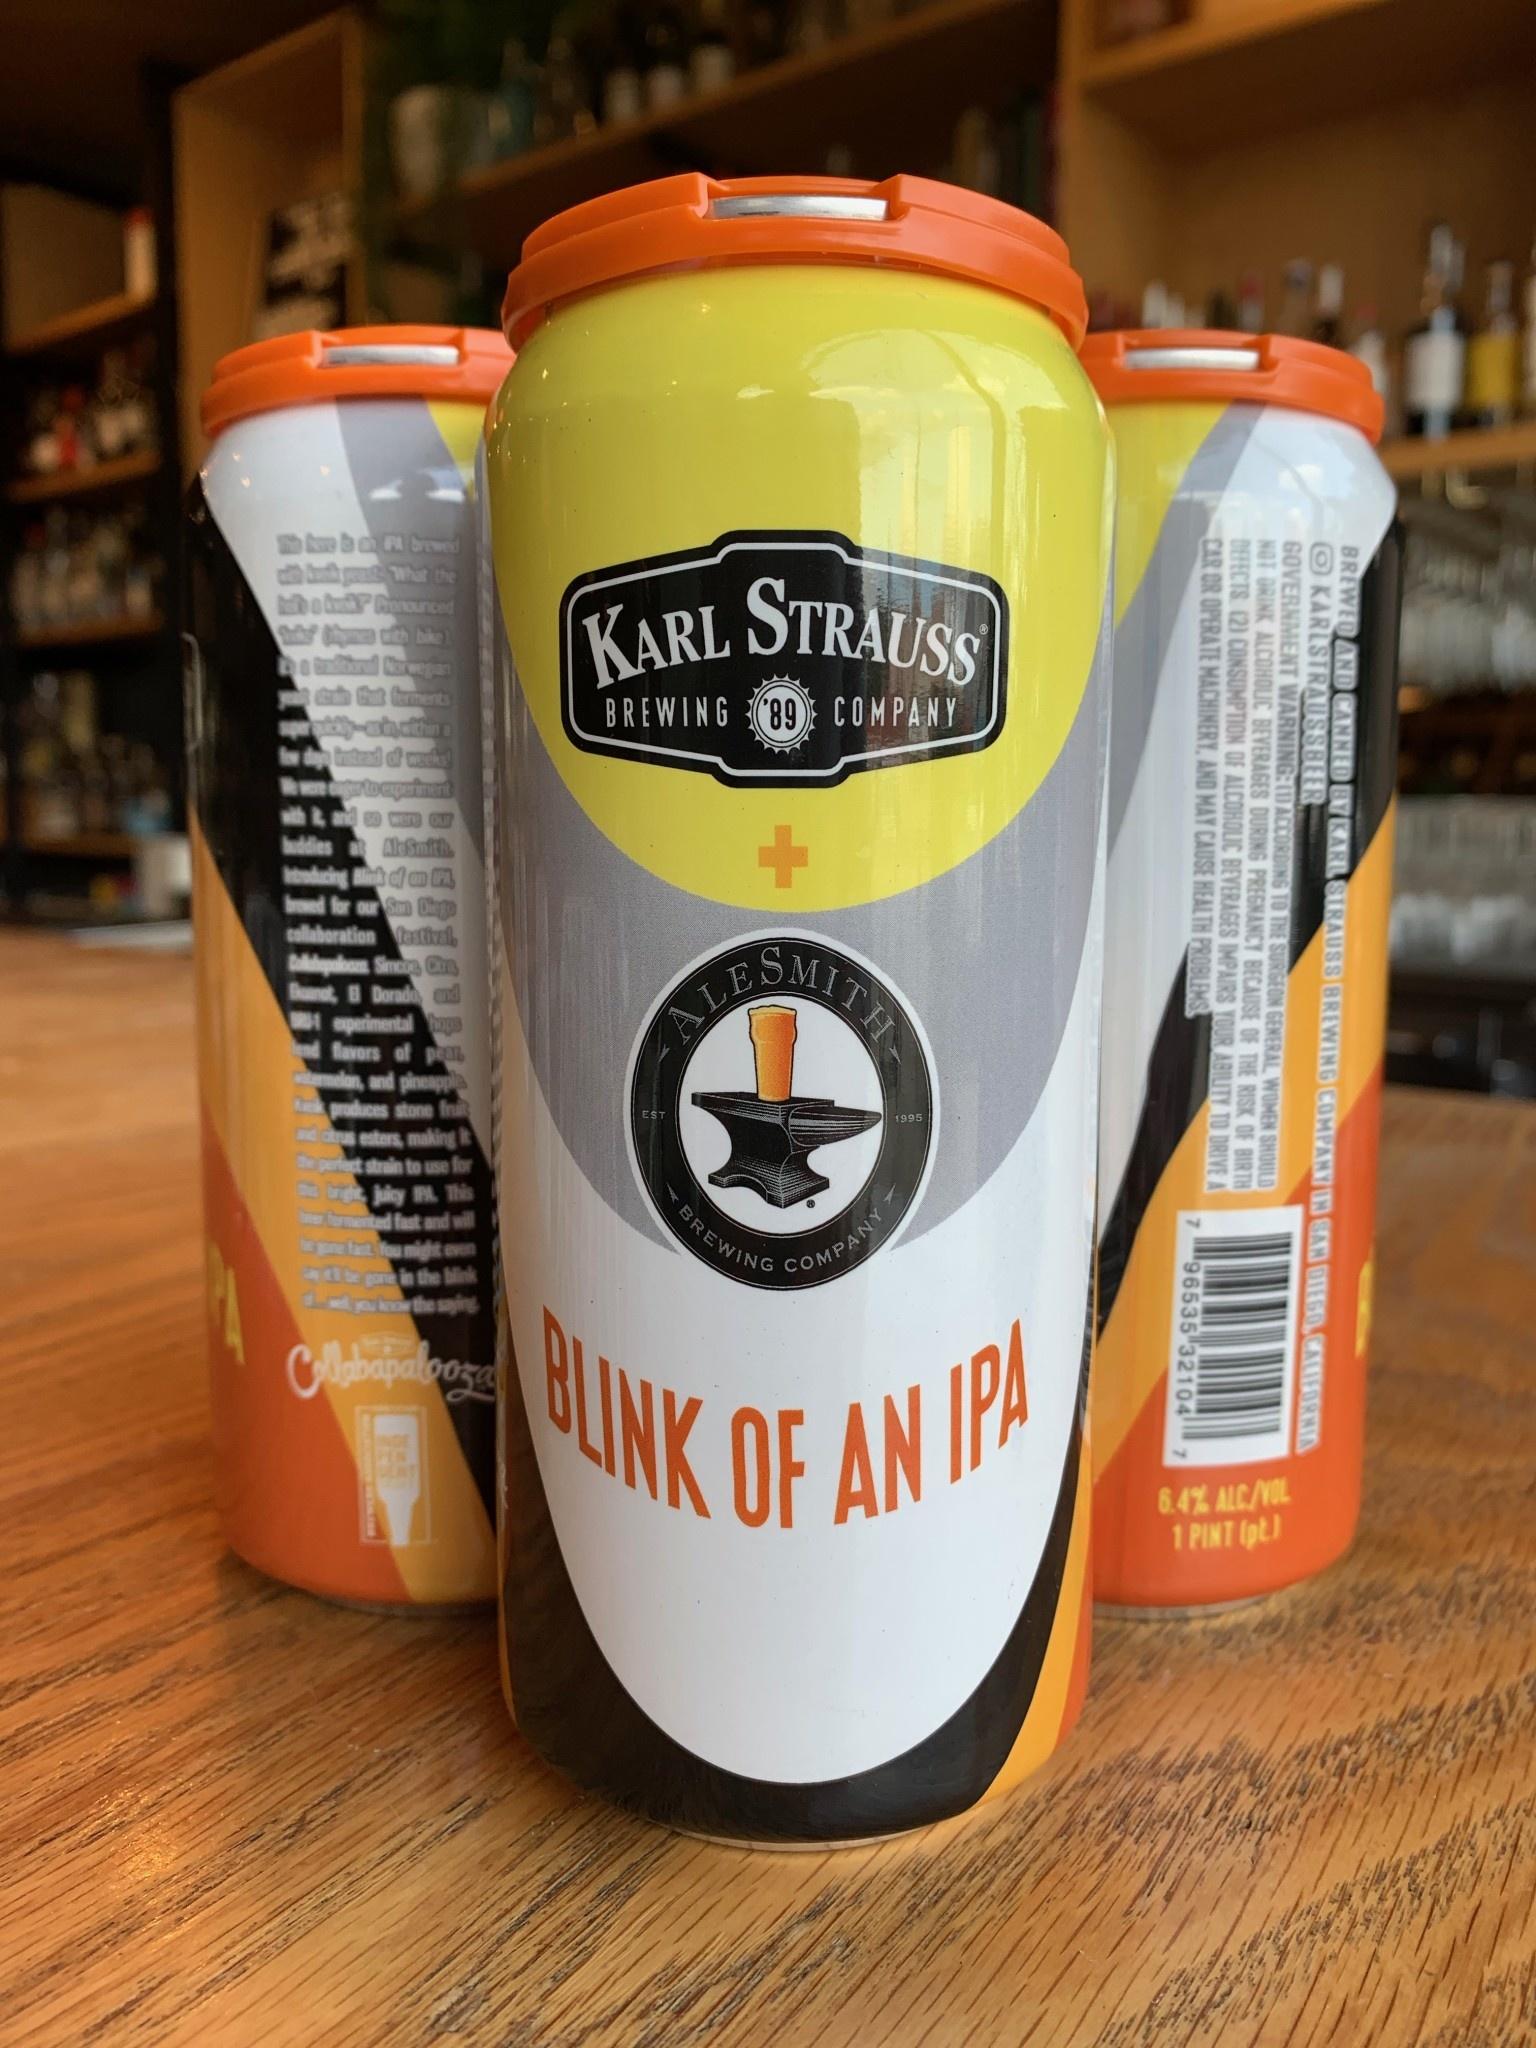 Karl Strauss Karl Strauss Brewing Blink of an IPA 16oz 4pk